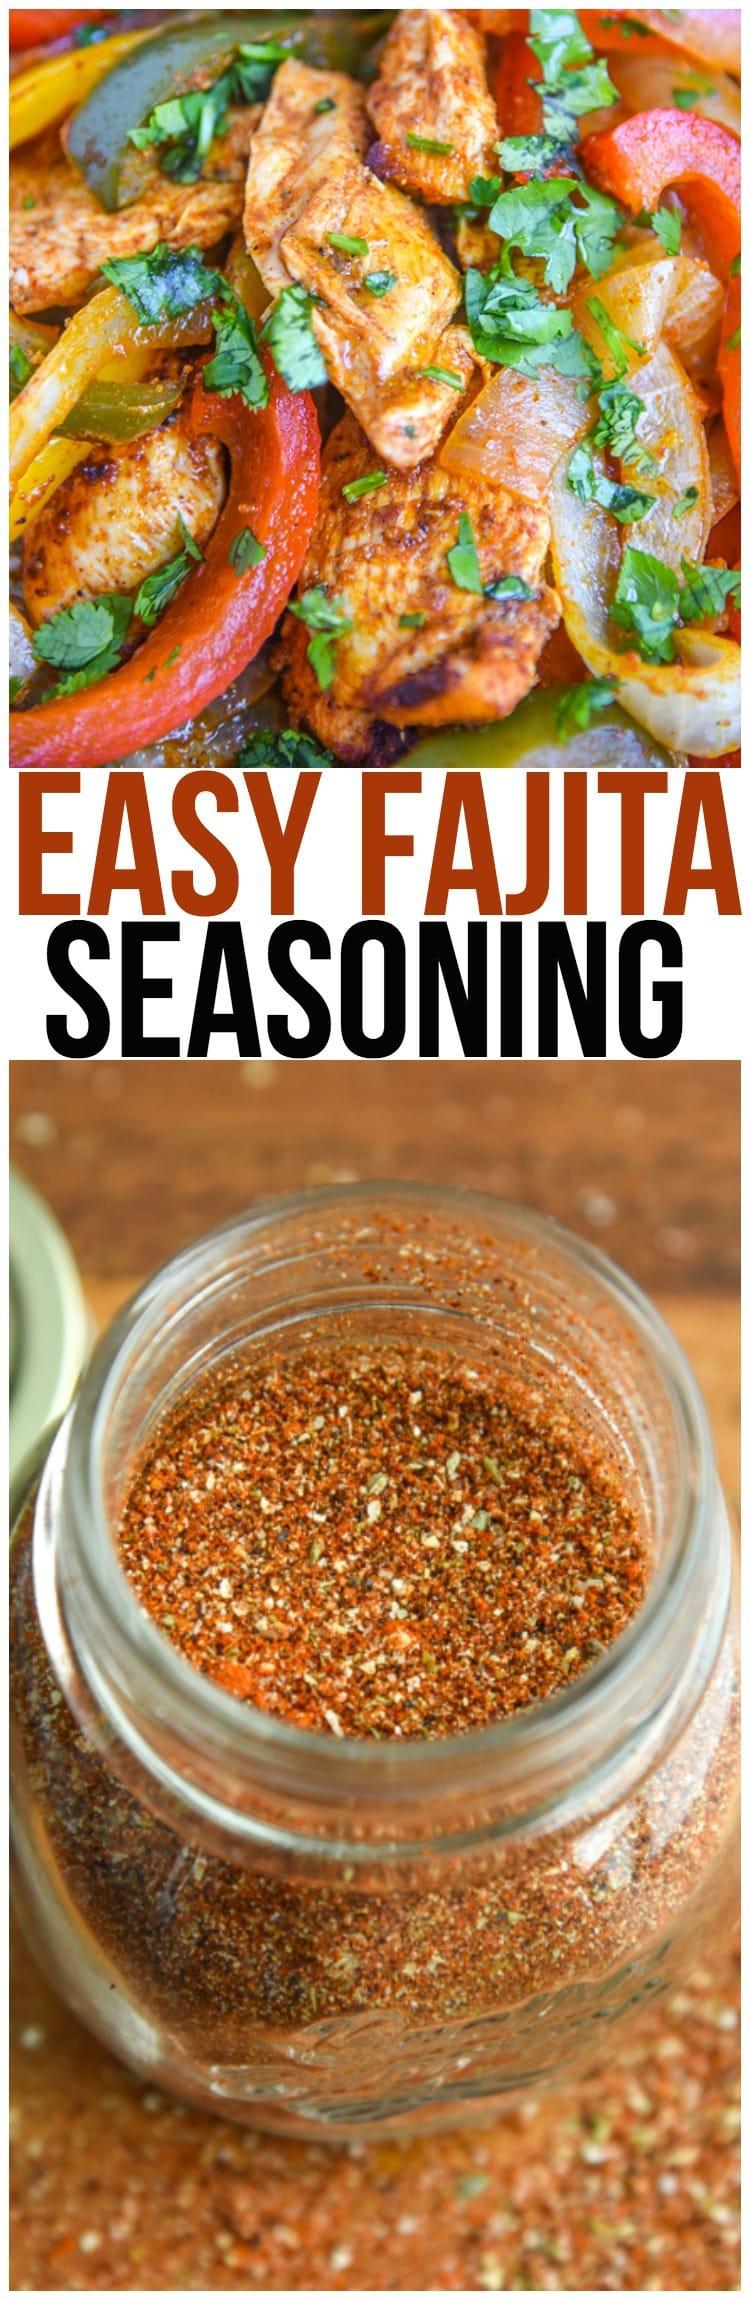 Make your own homemade fajita seasoning recipe instead of using a seasoning packet! It's perfect for chicken fajitas, steak fajitas, shrimp fajitas, or even vegetarian fajitas.